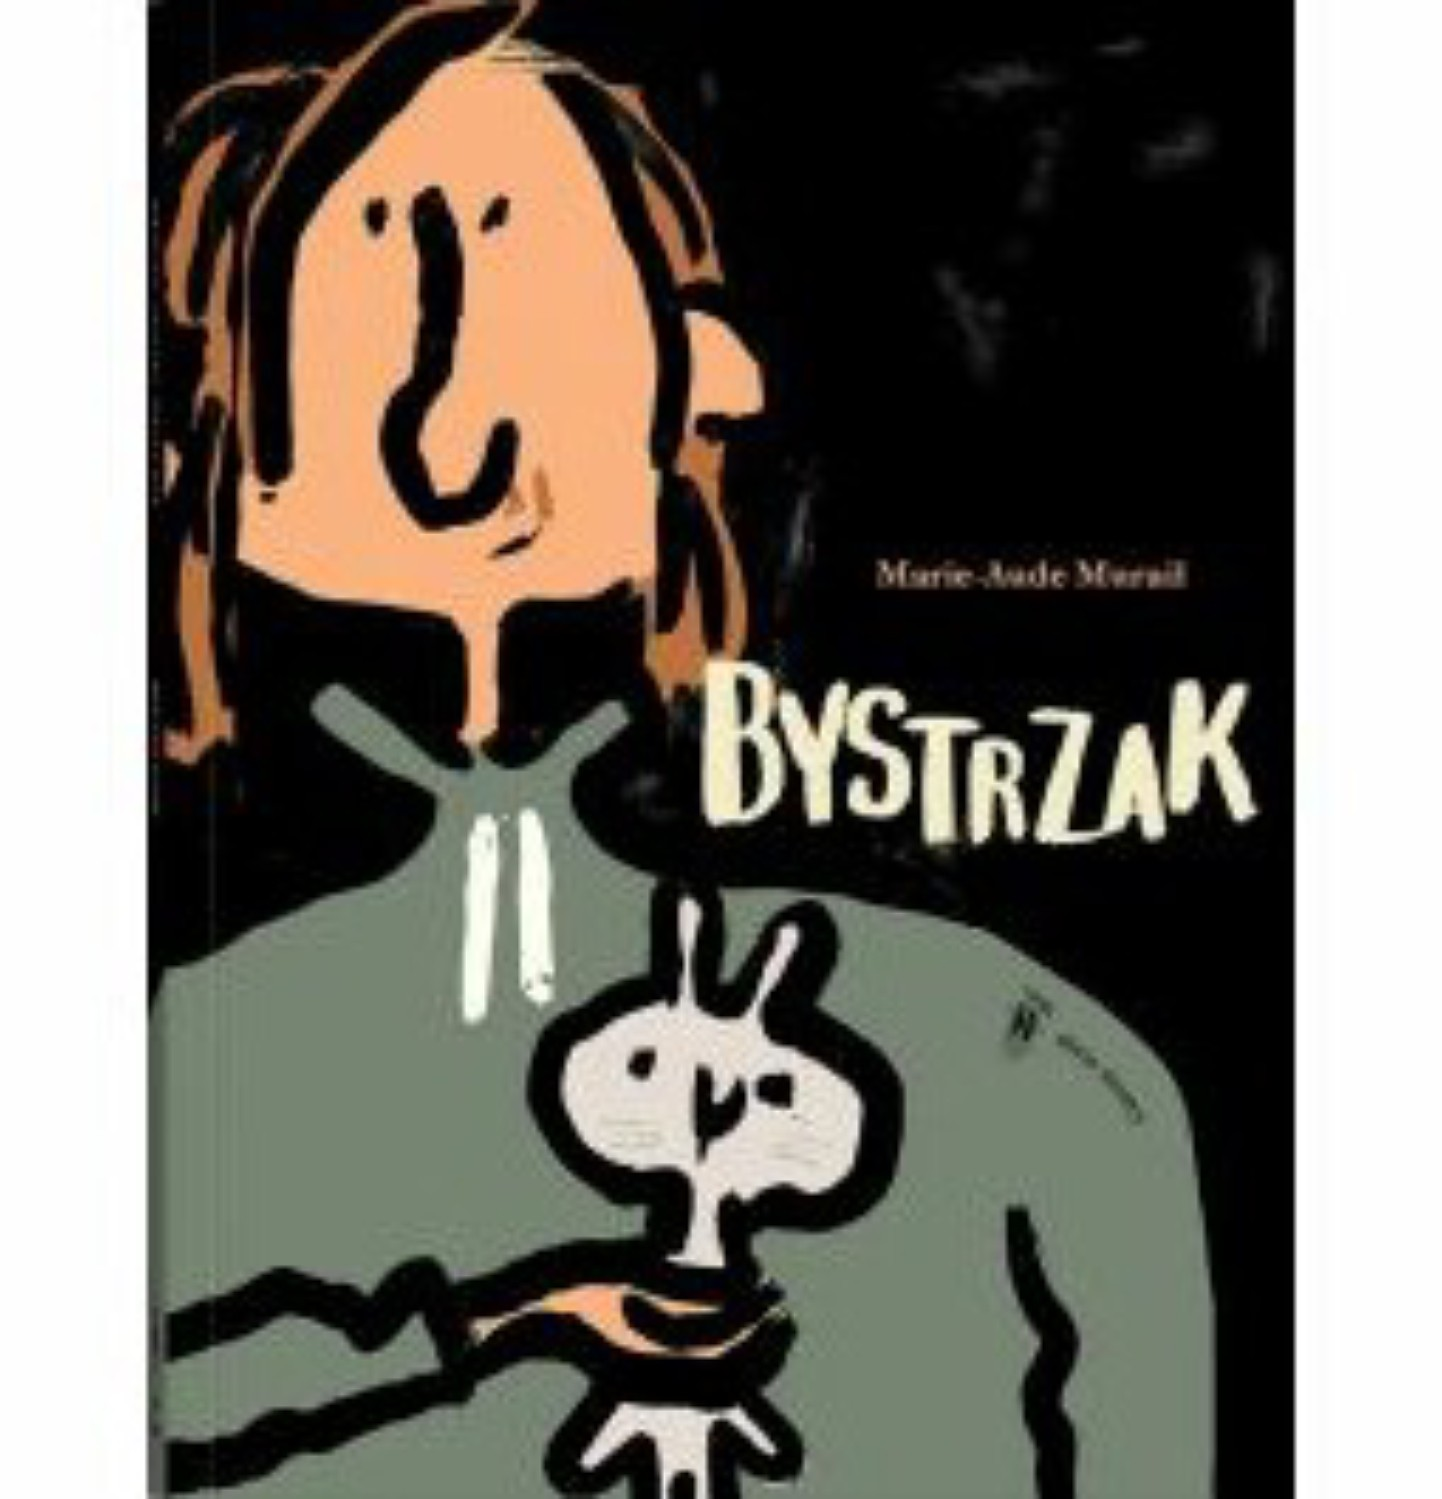 Endo - Bystrzak BK92151_1